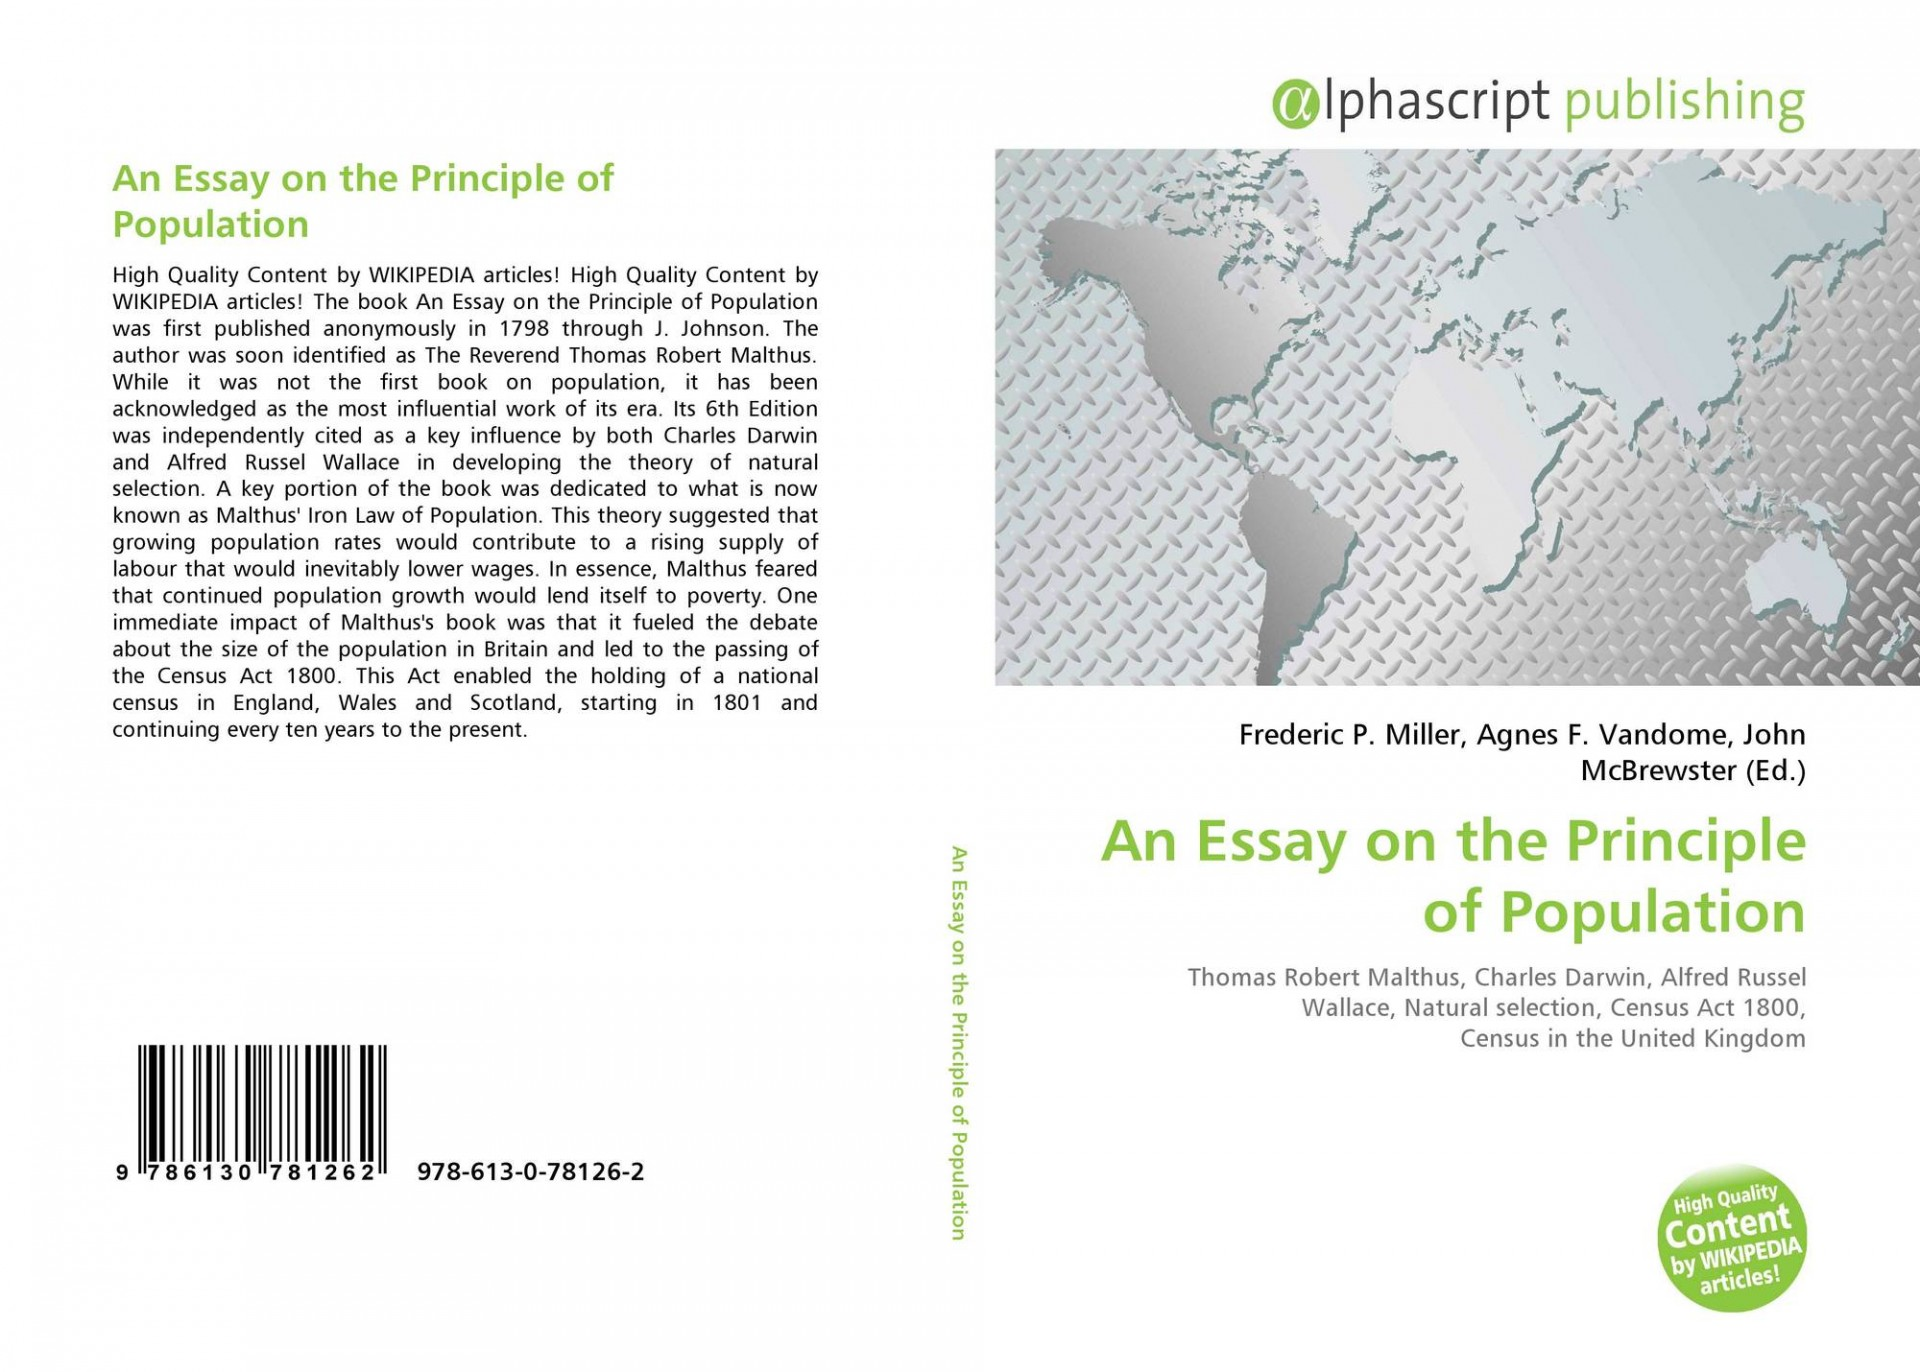 022 Essay On The Principle Of Population Example Singular Pdf By Thomas Malthus Main Idea 1920